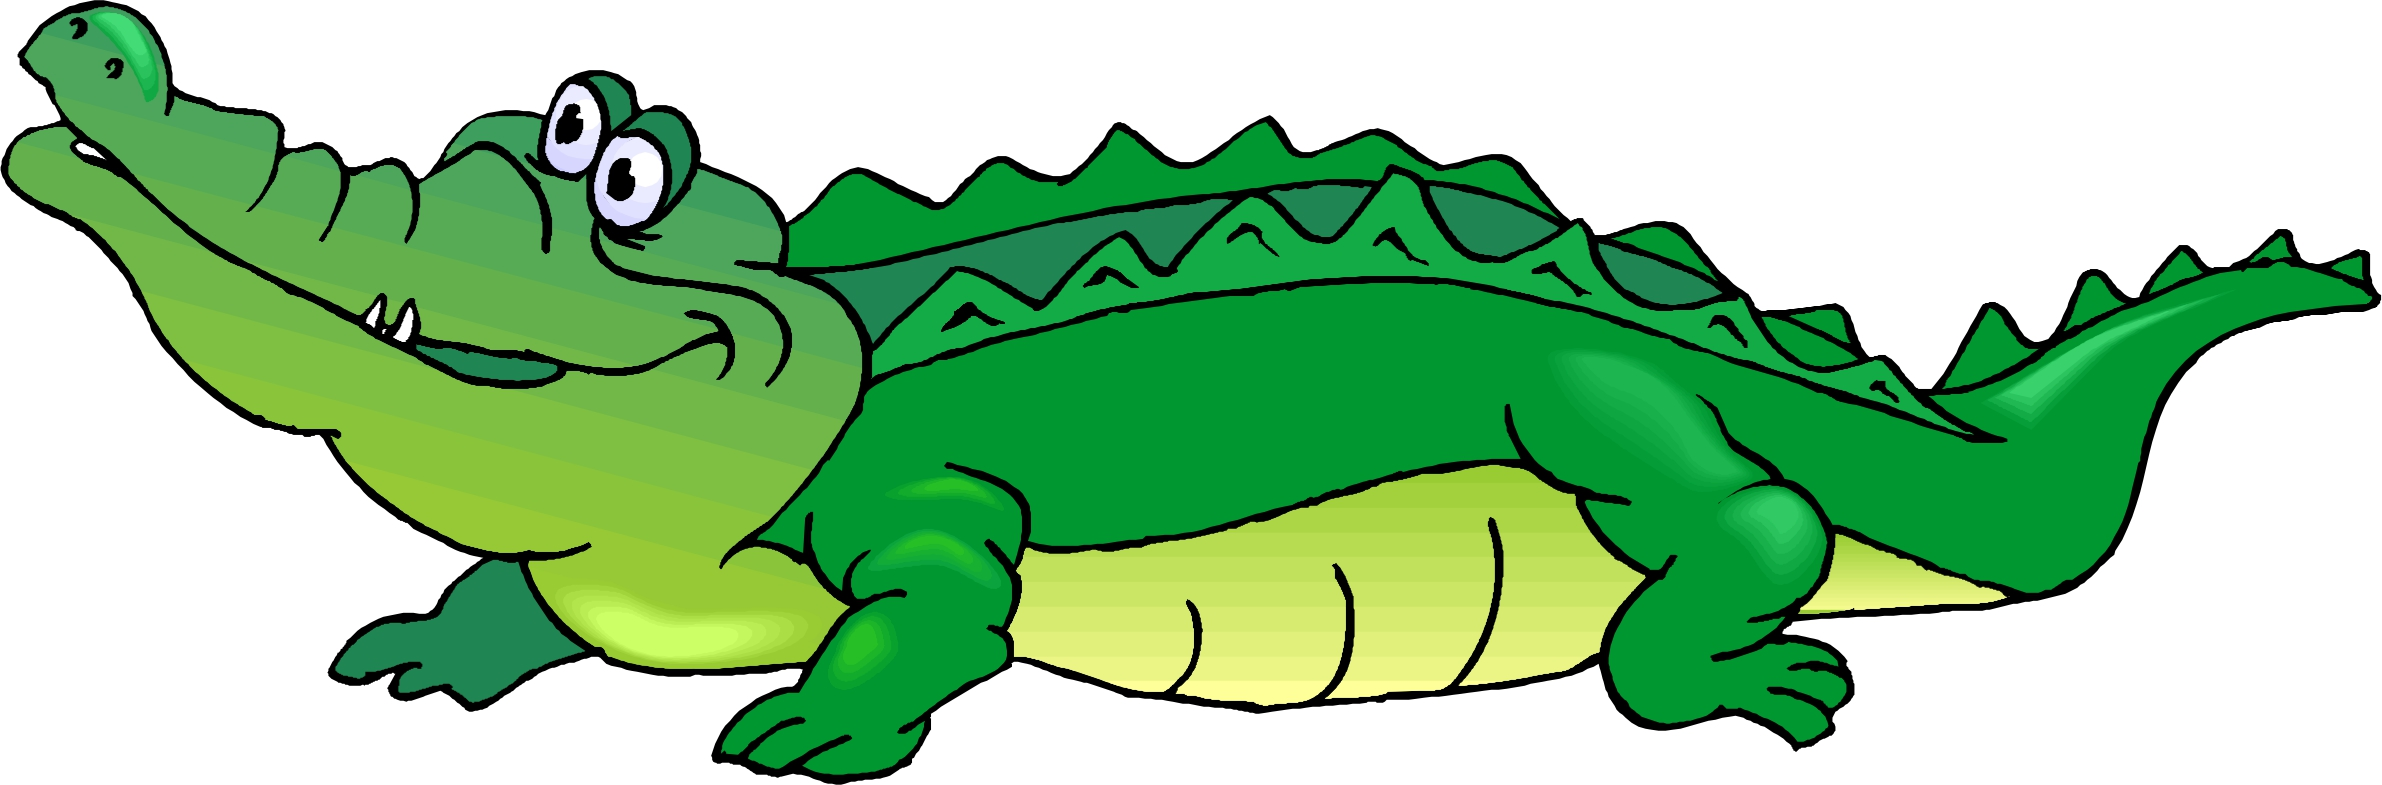 Alligator clipart printable Cartoon Crocodile Crocodile Clipart cliparts